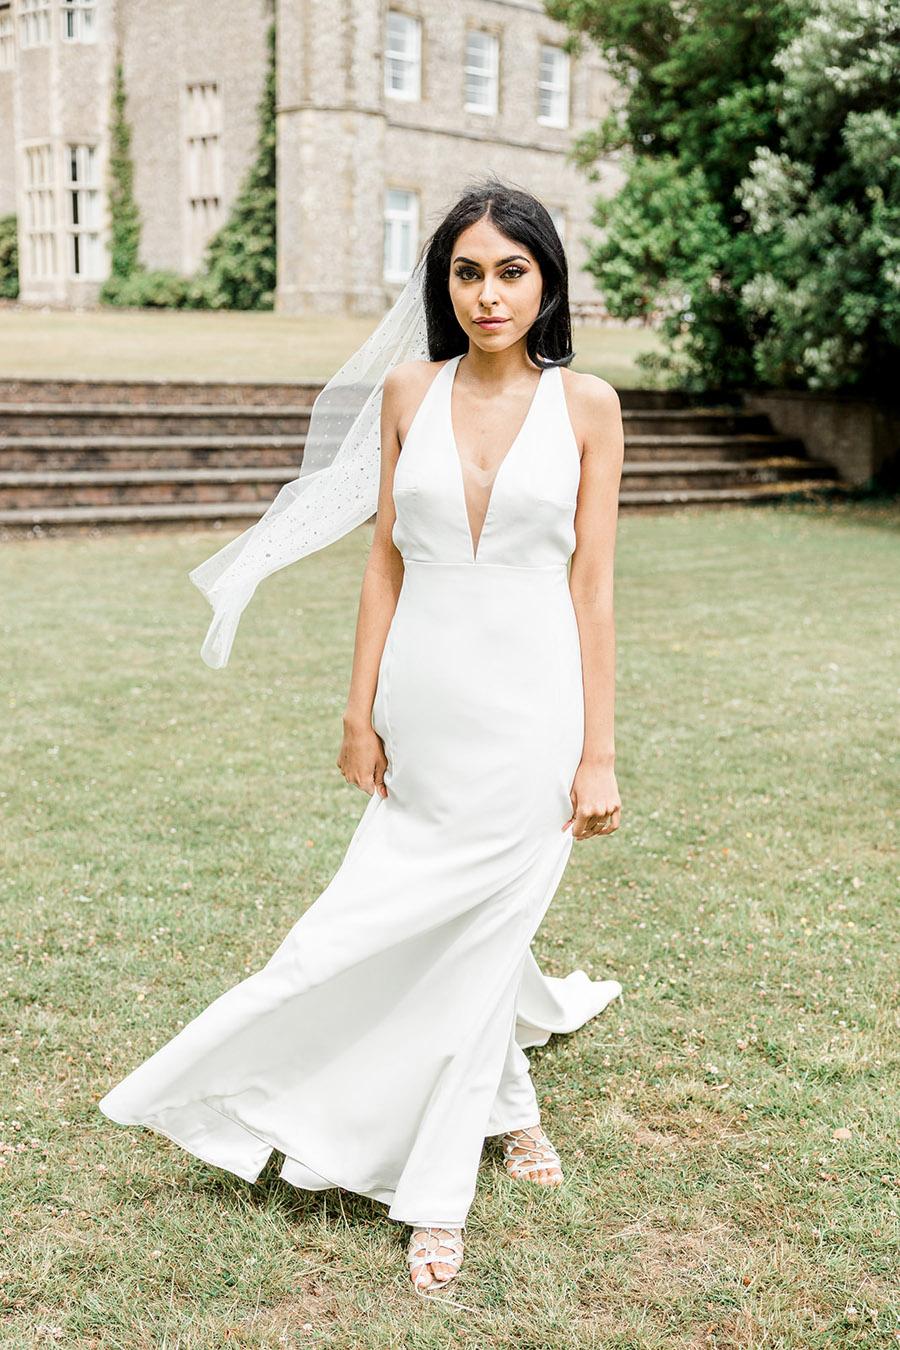 Modern Boho wedding style inspiration from Slindon House, photographer credit Kelsie Scully Photography (39)